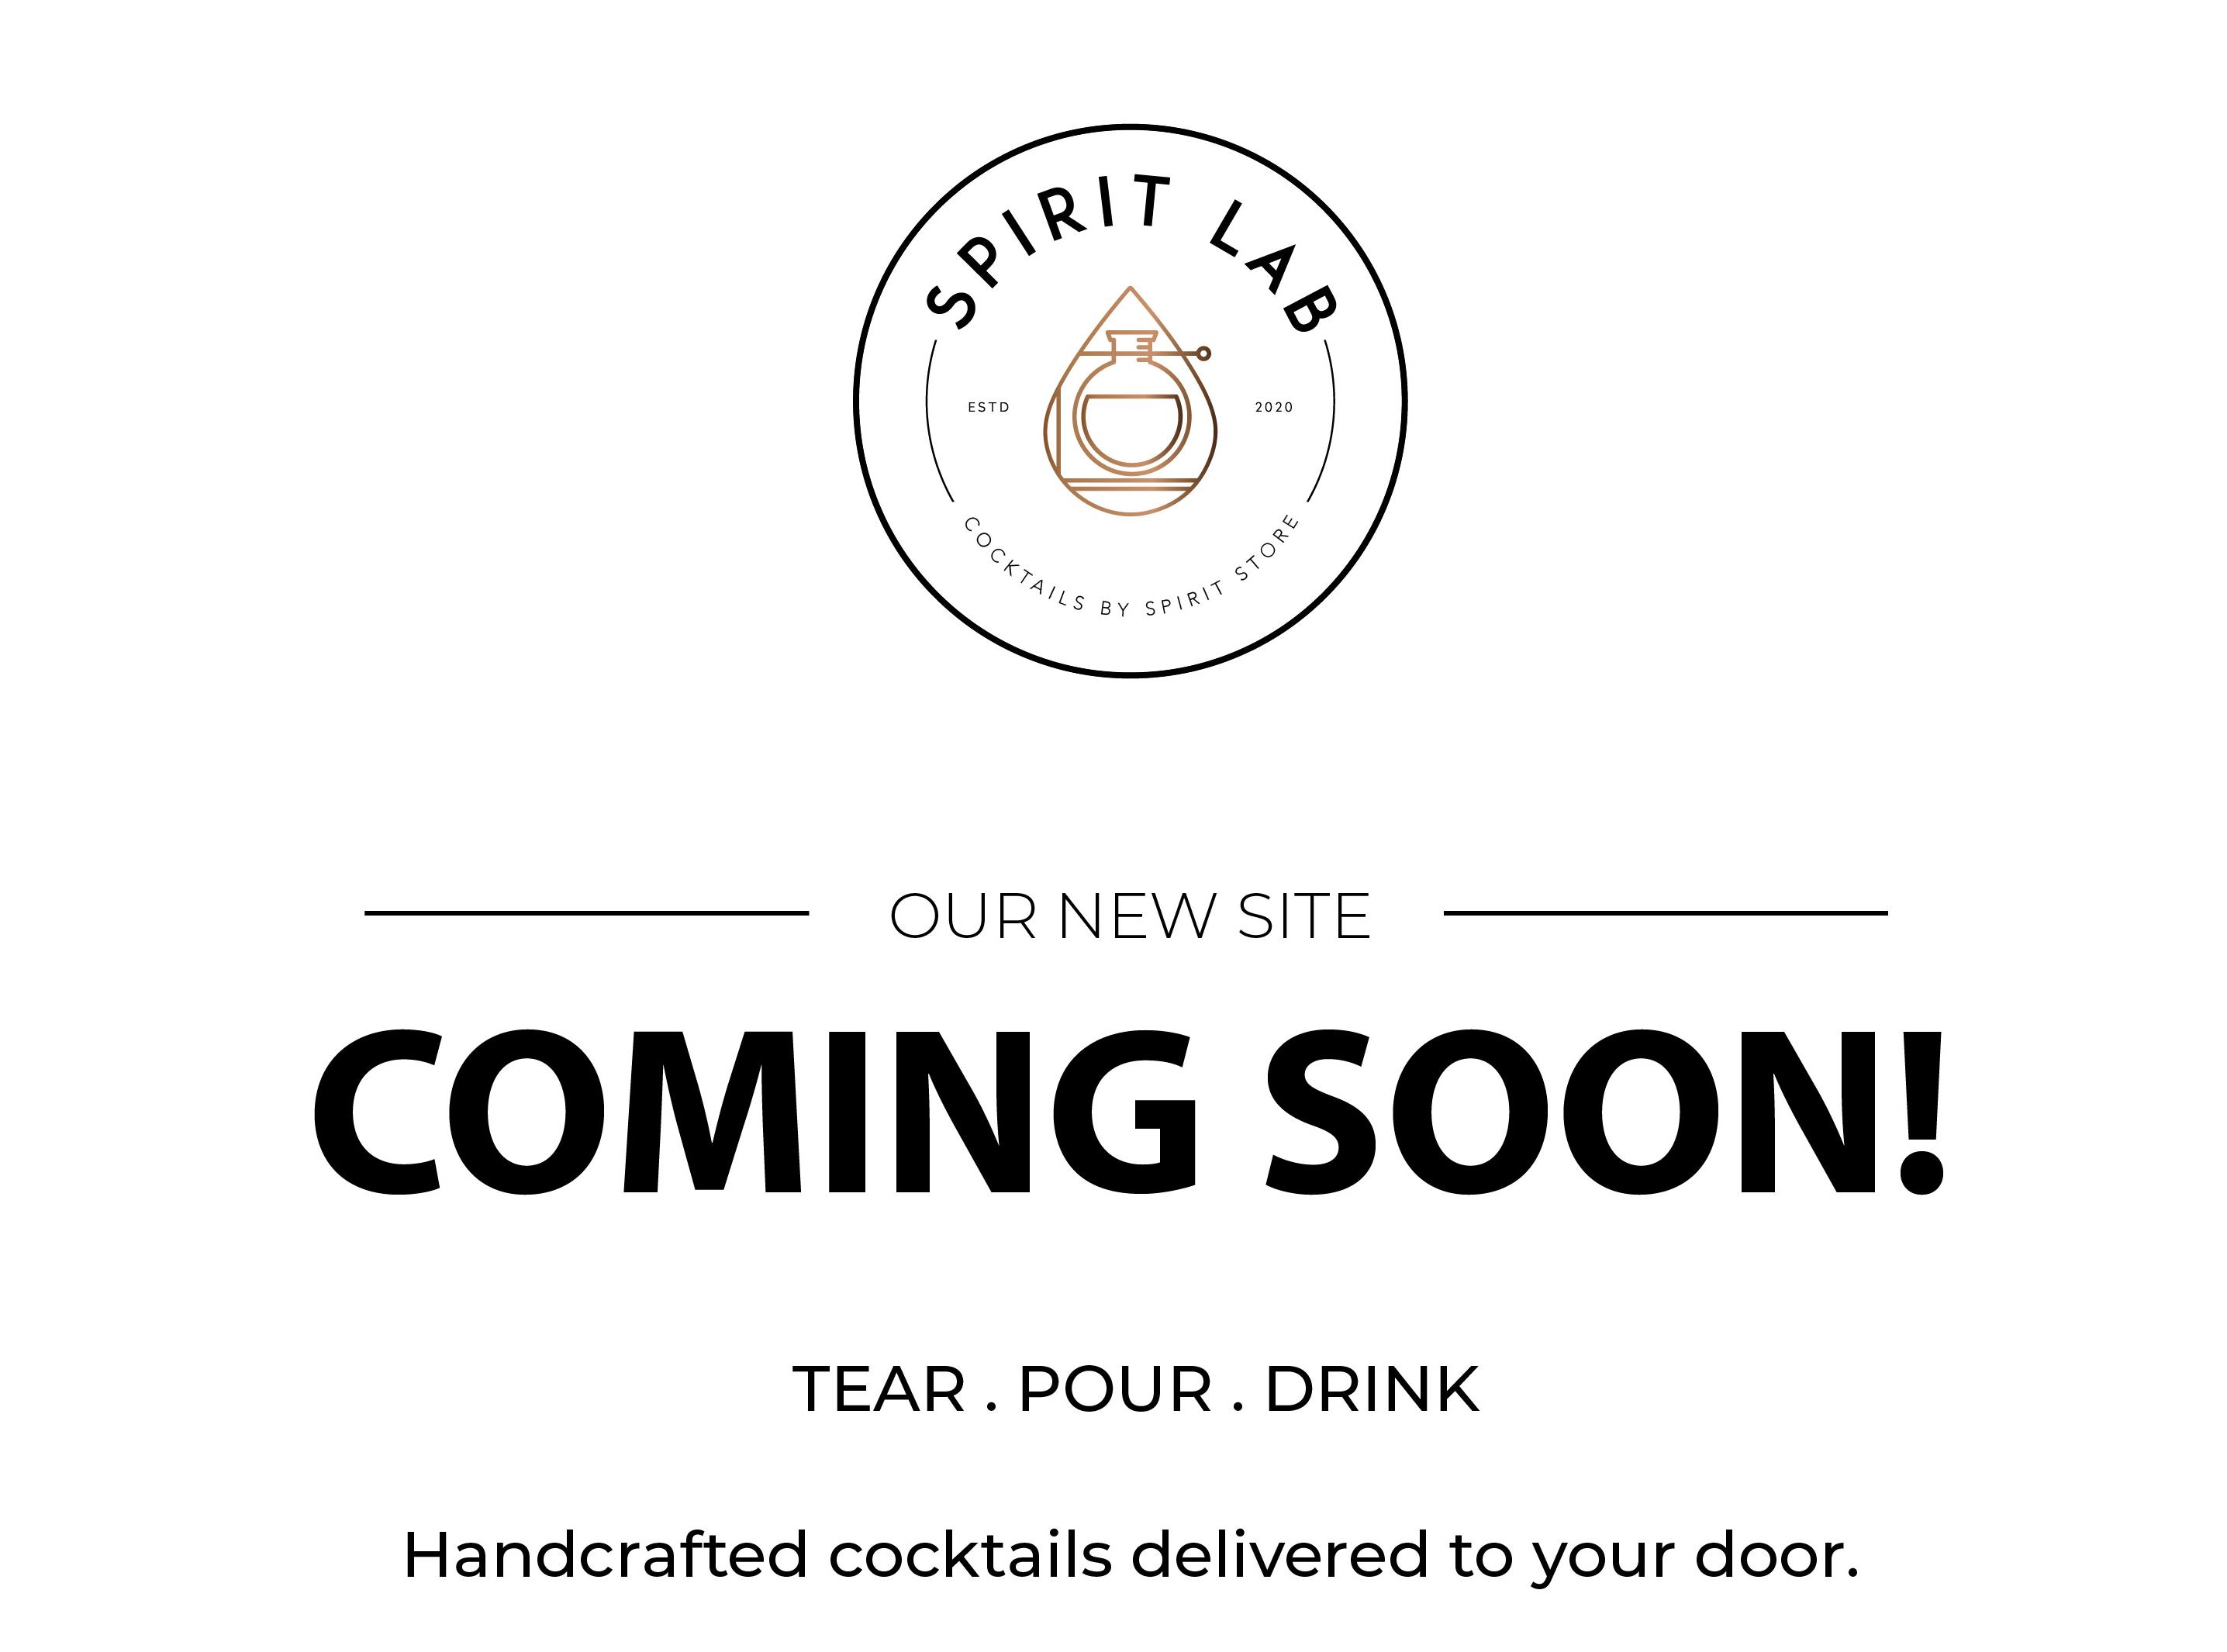 Spirit Lab - Handcrafted Cocktails